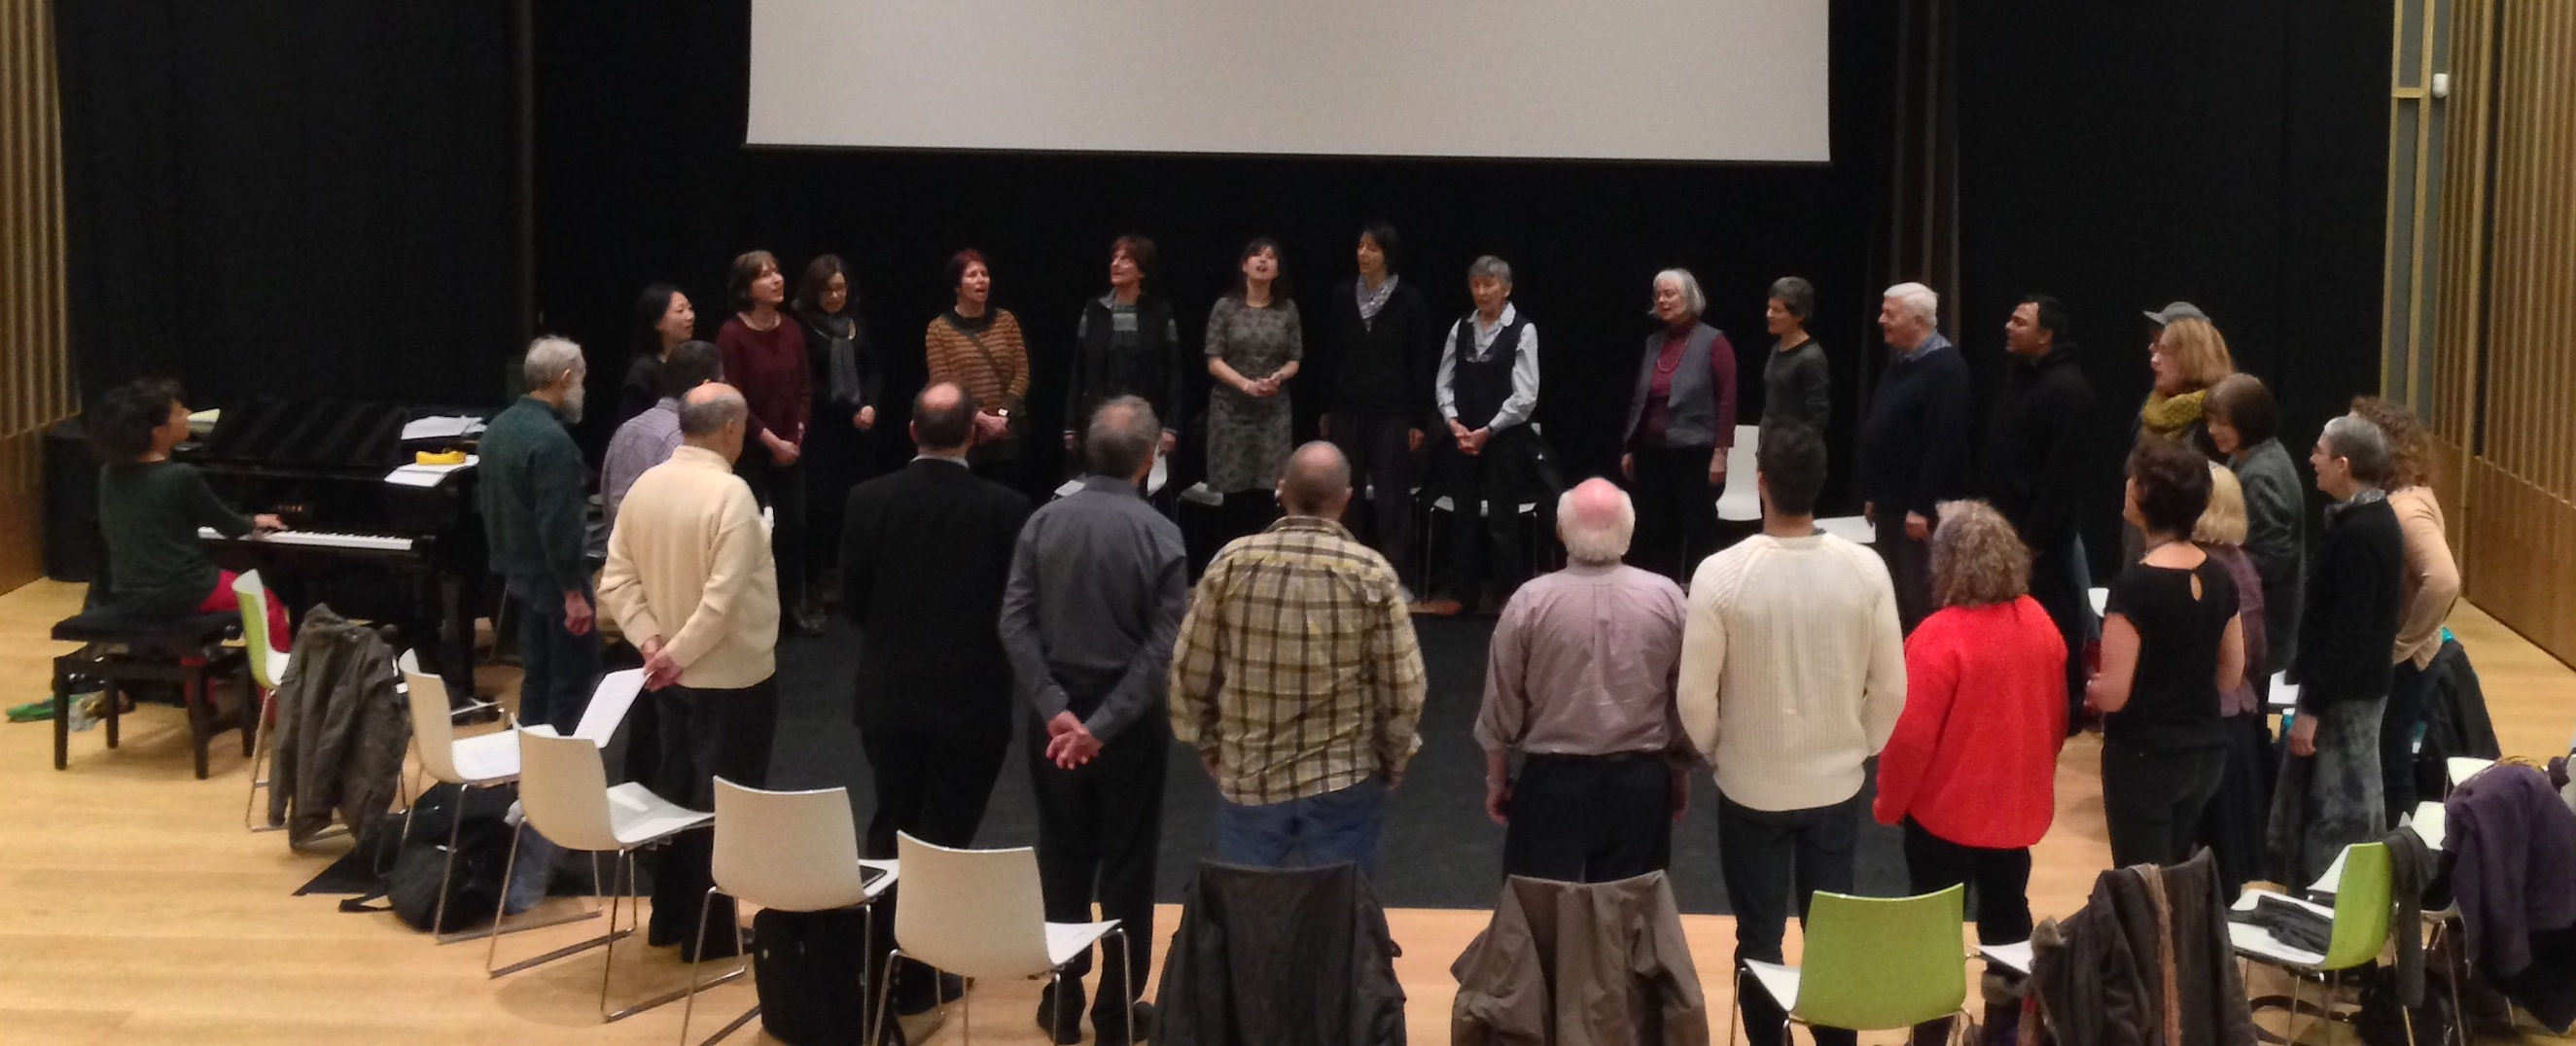 Yid choir7